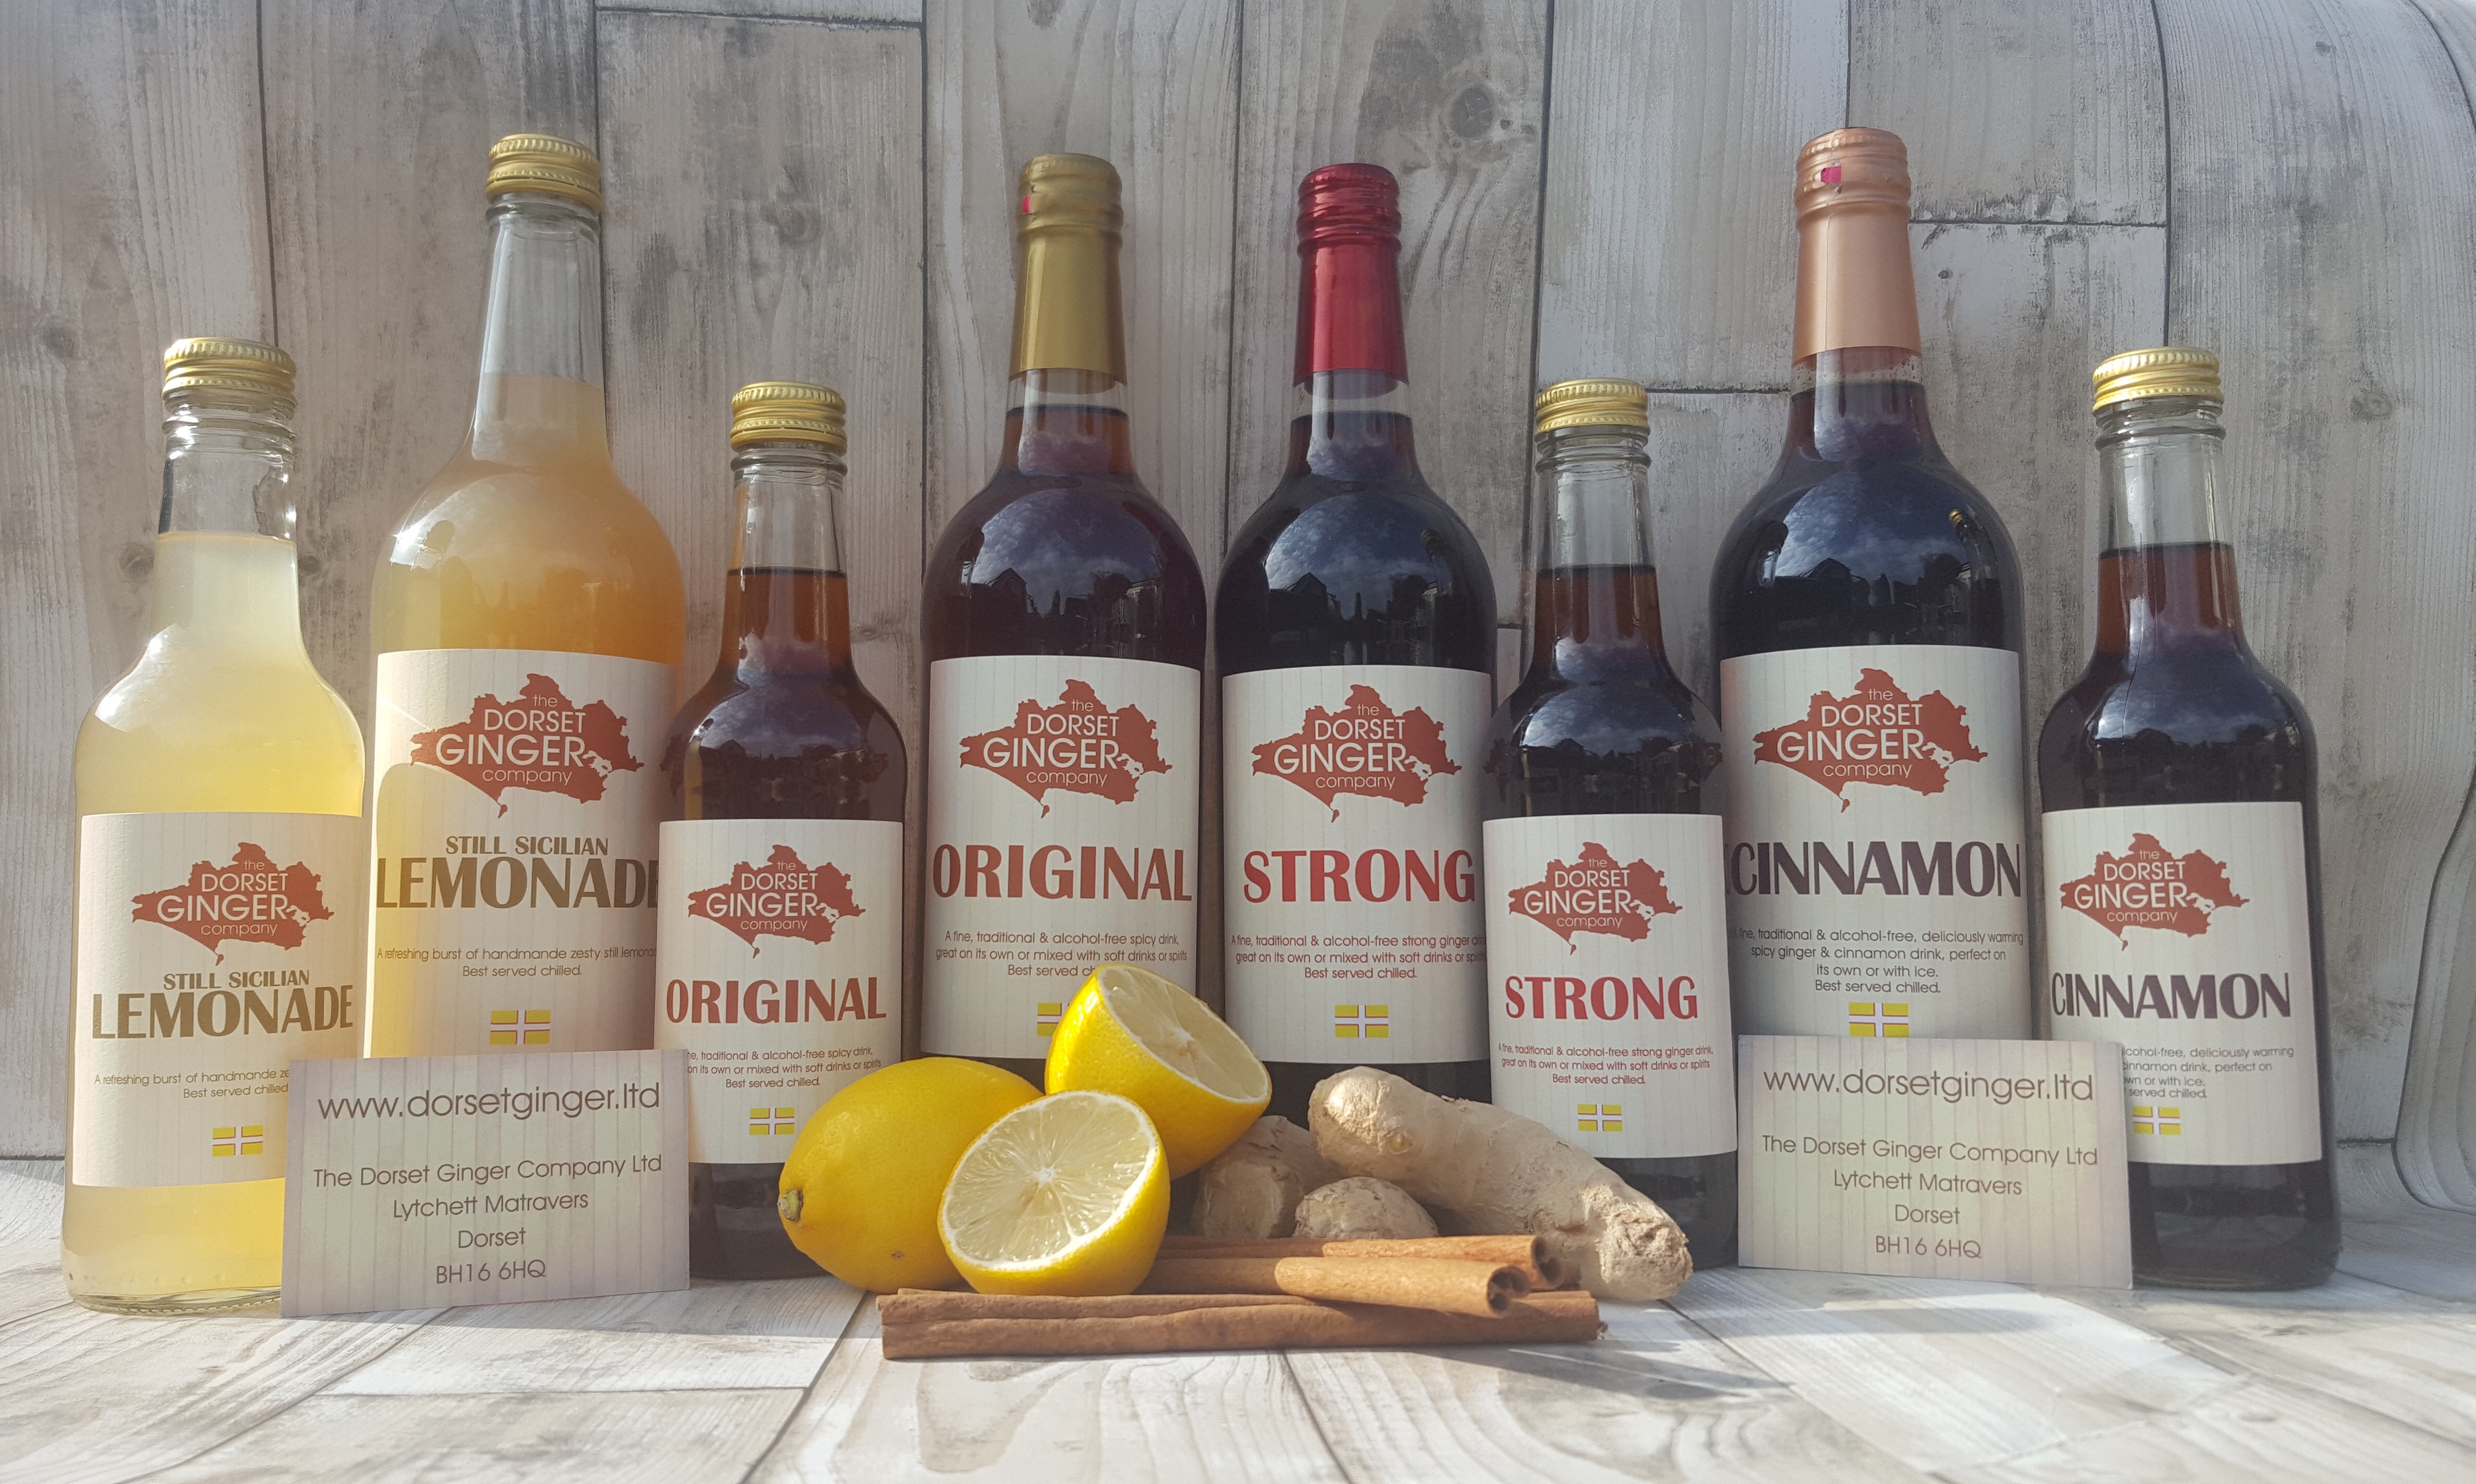 Review of Dorset ginger